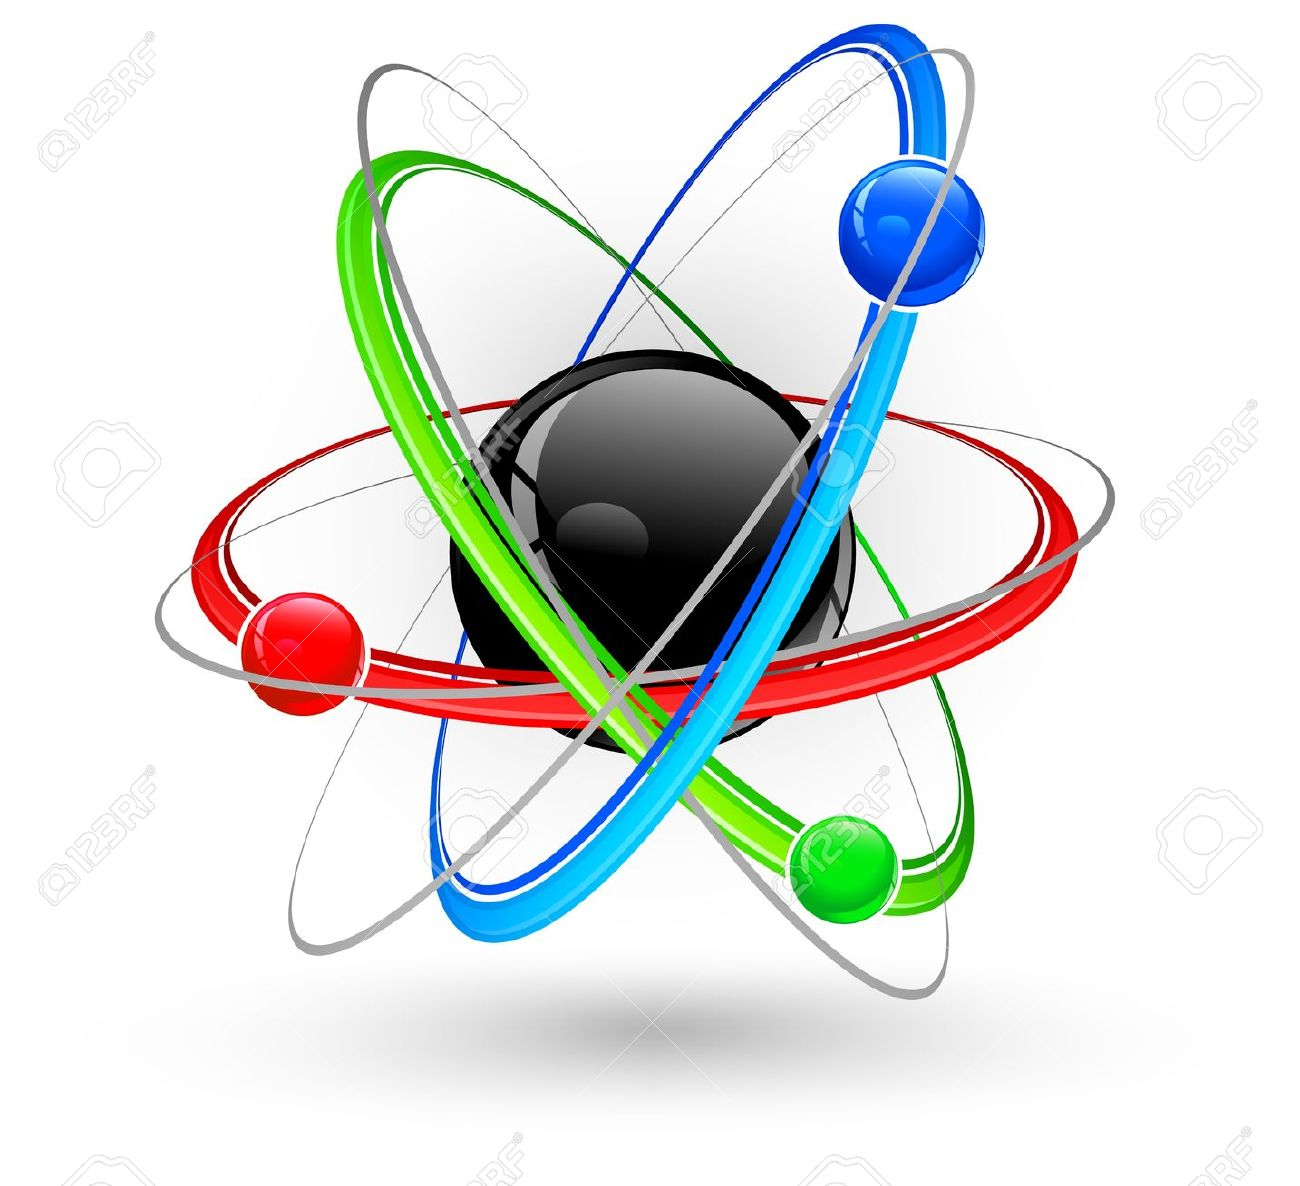 Atom color clipart.